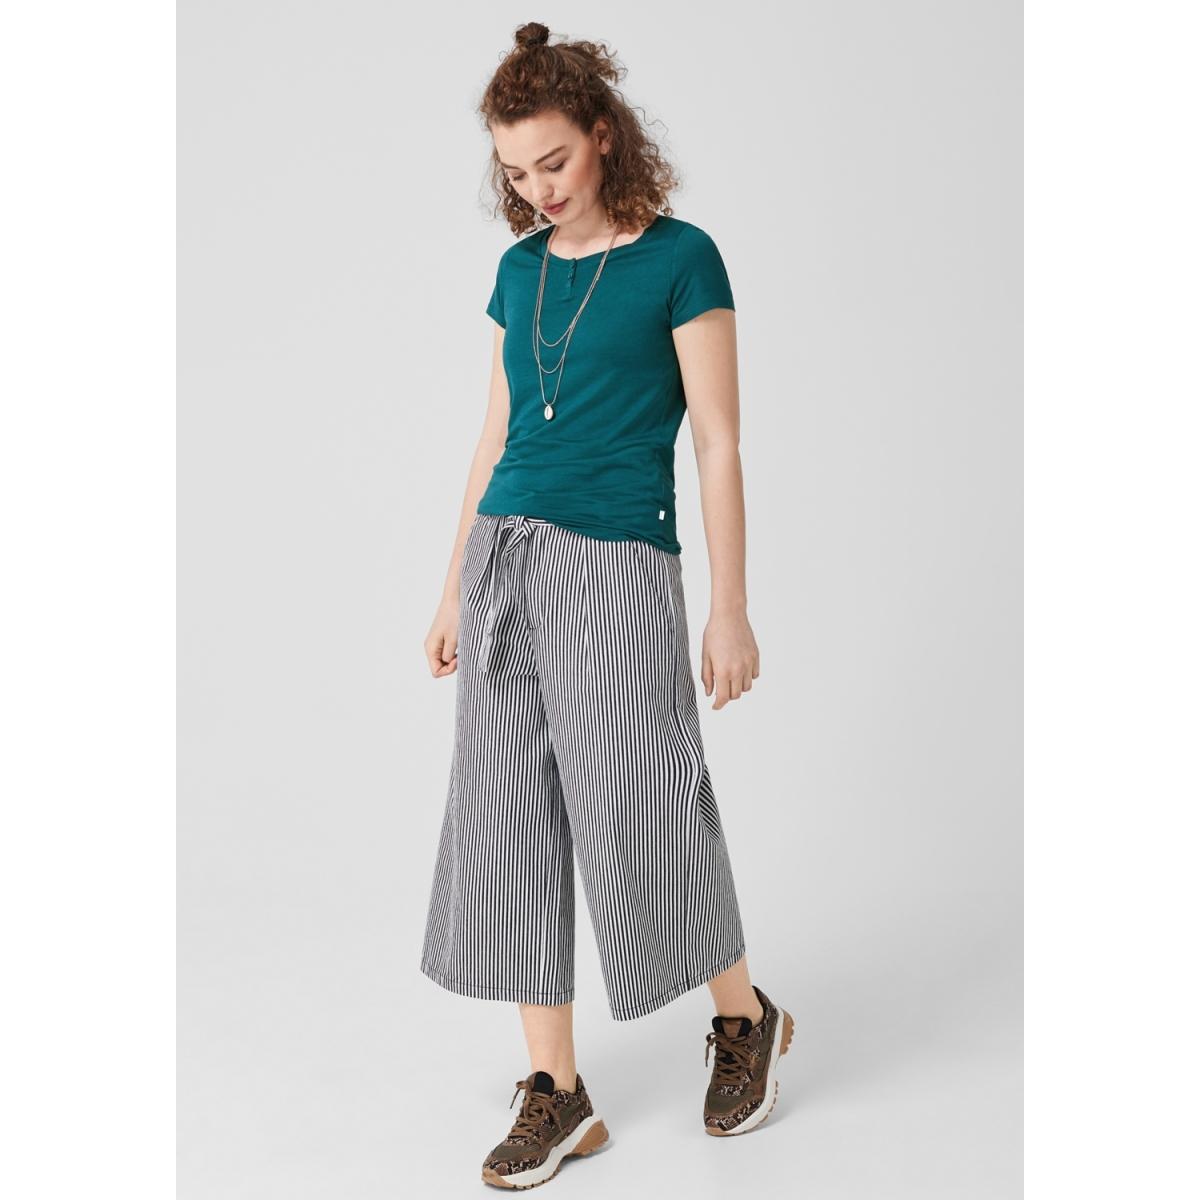 t shirt met knoopjes 46907325570 q/s designed by t-shirt 6765